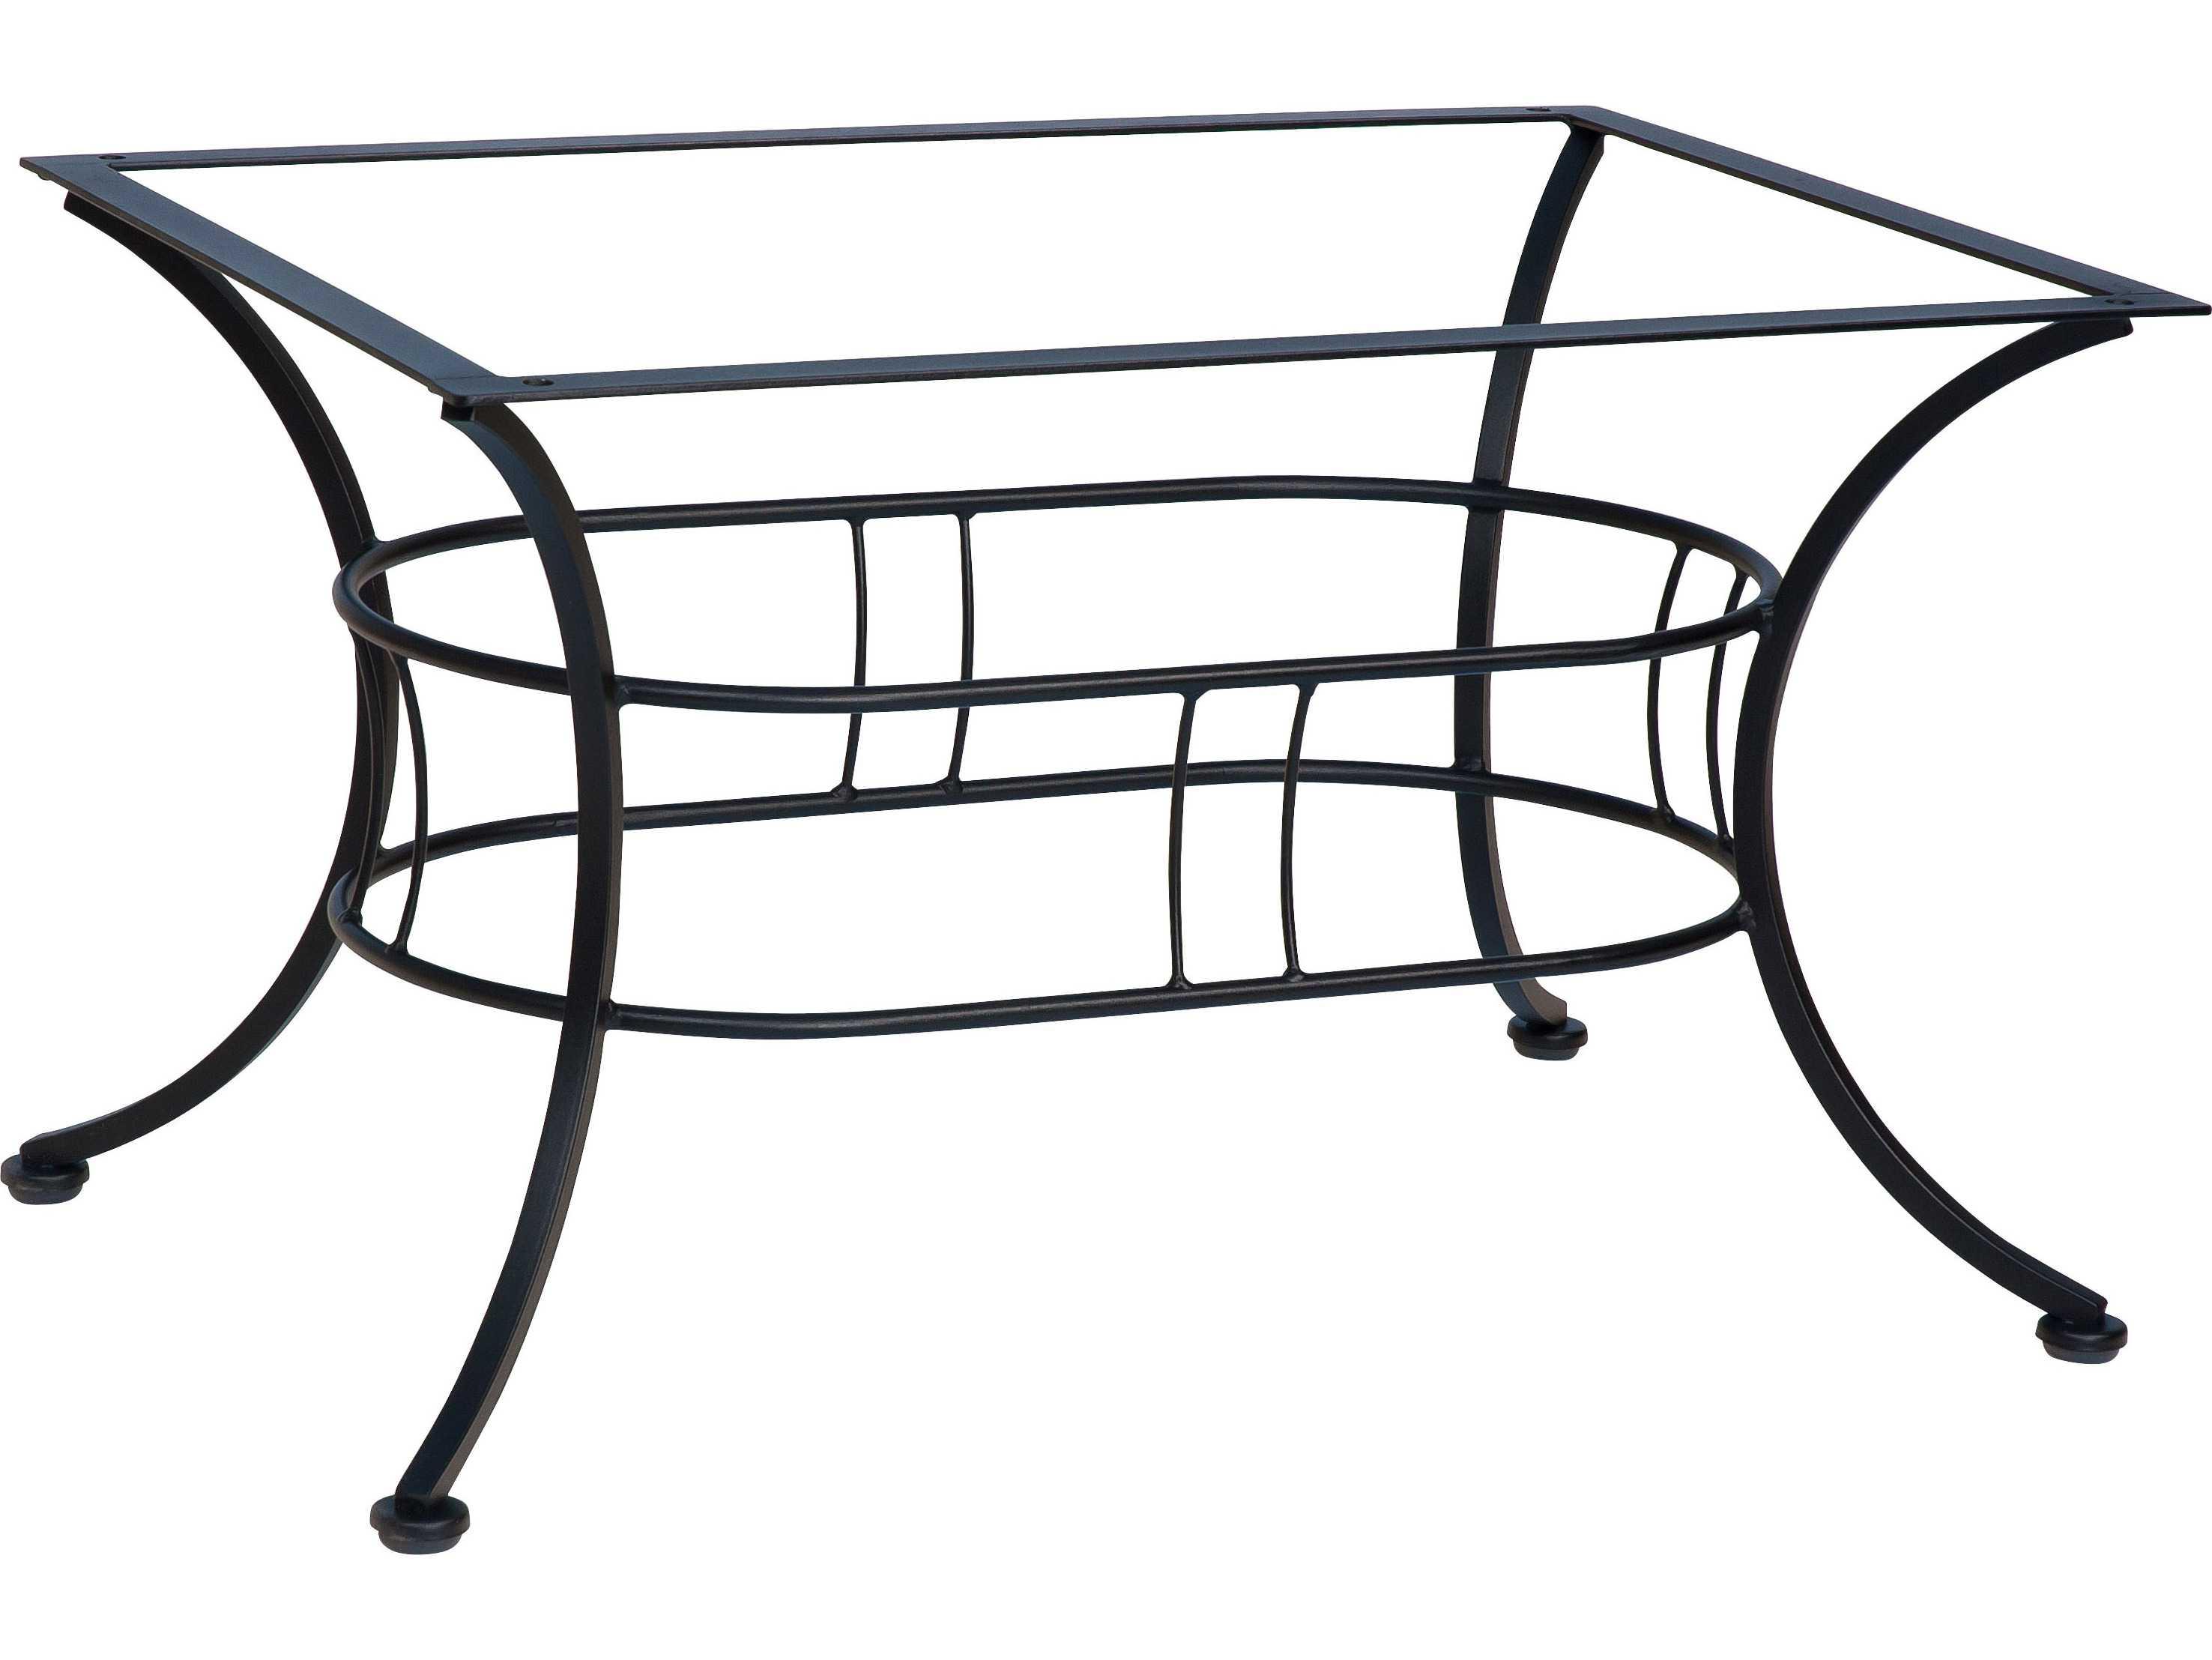 Woodard Easton Wrought Iron Coffee Table Base 1n4500